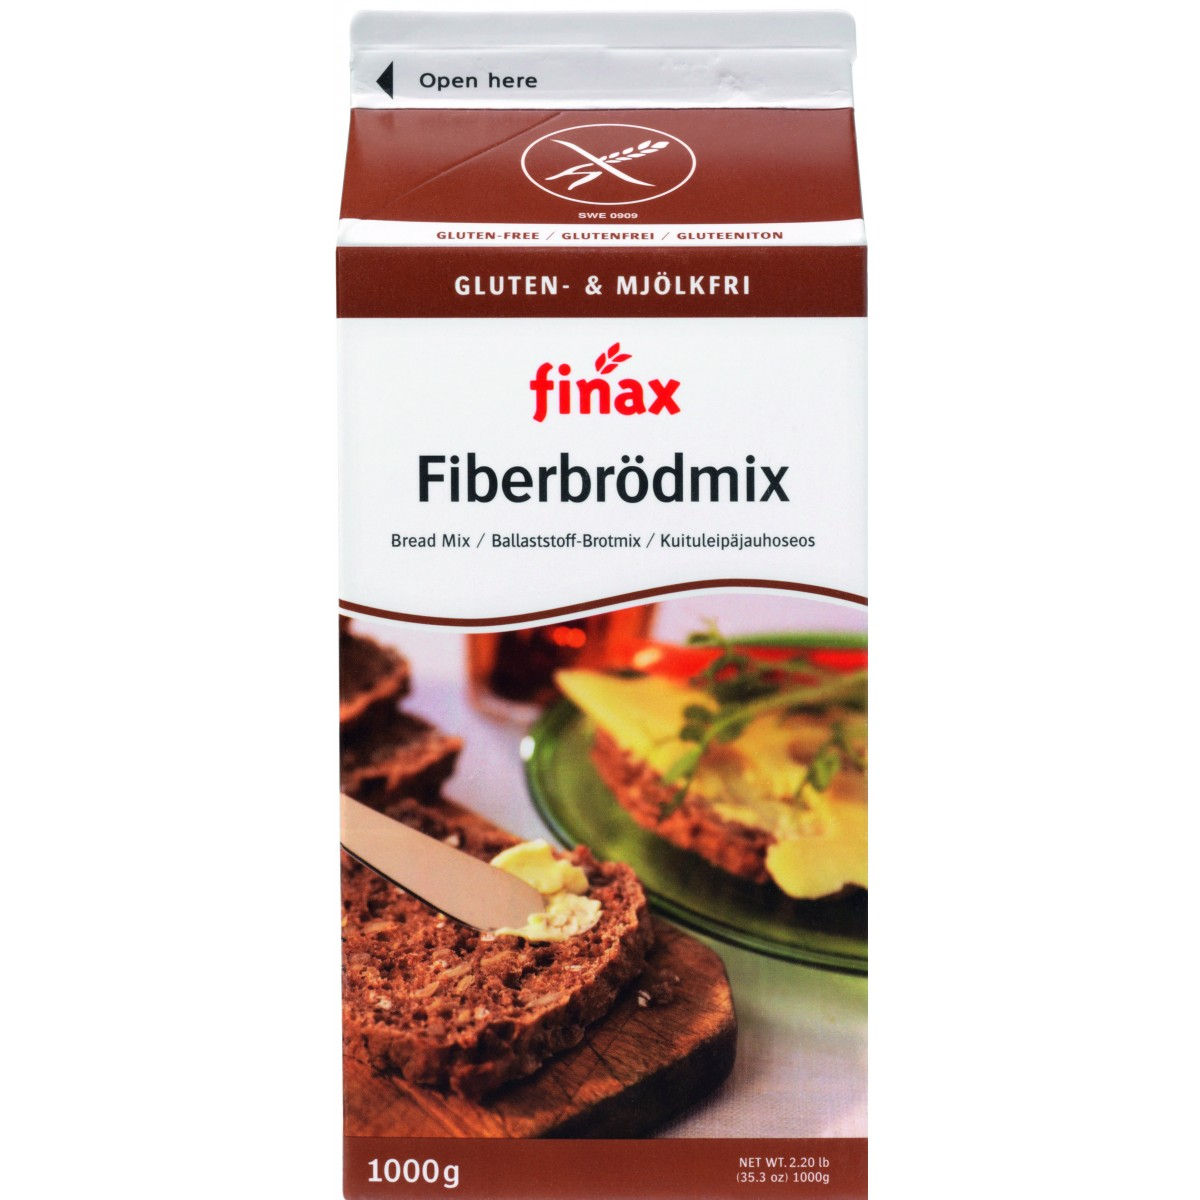 Fiber Broodmix